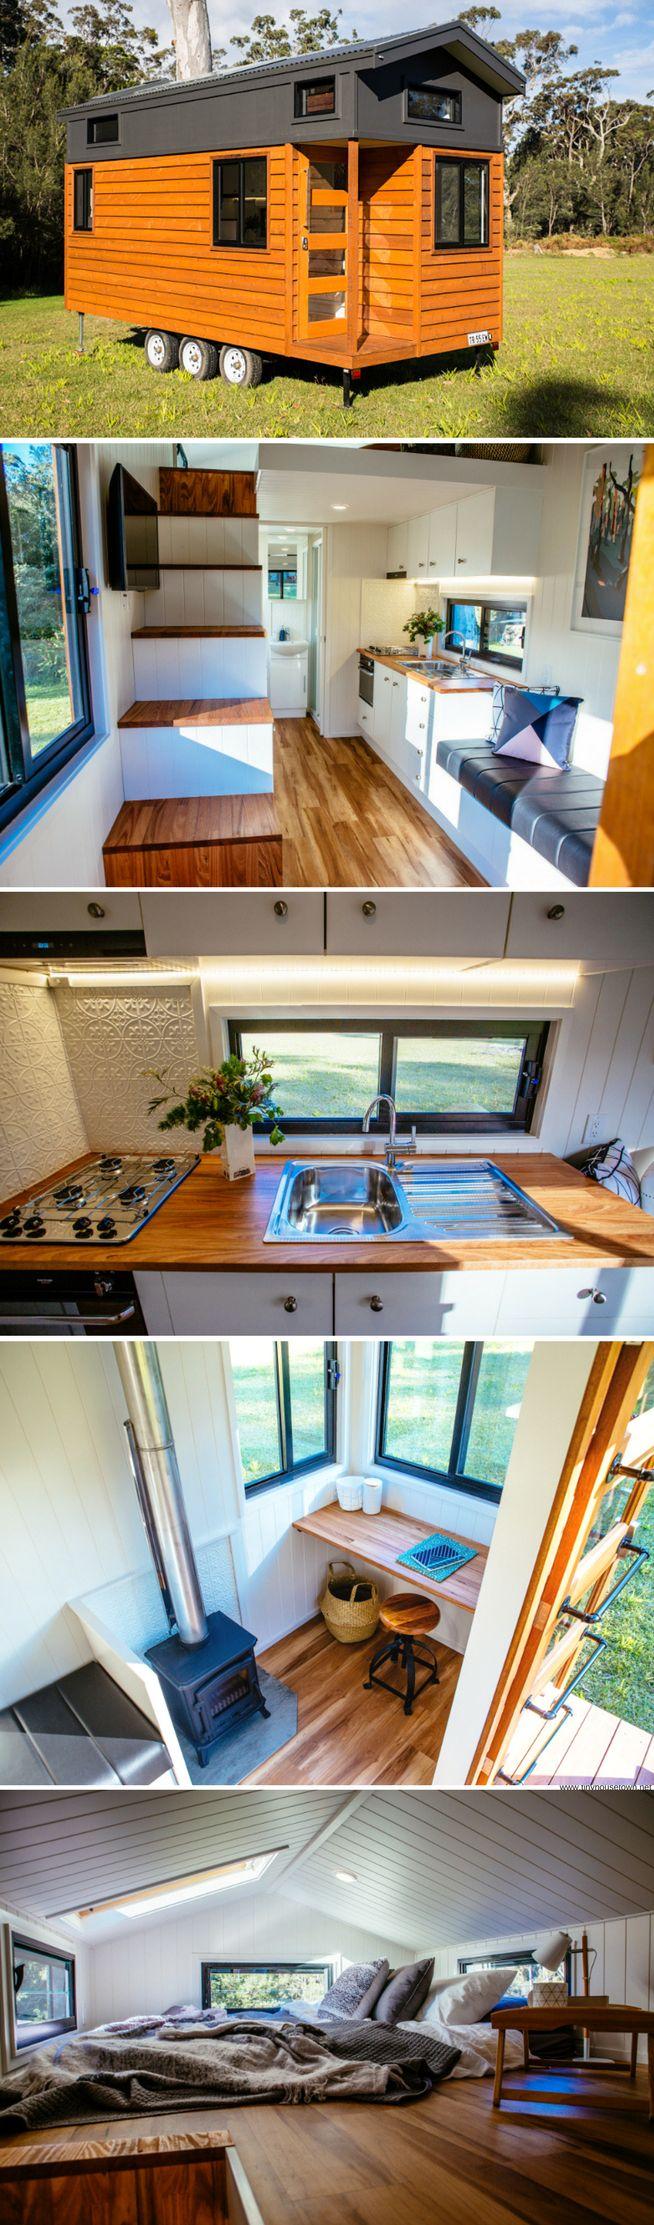 The Graduate Series tiny house from Designer Eco Tiny Homes